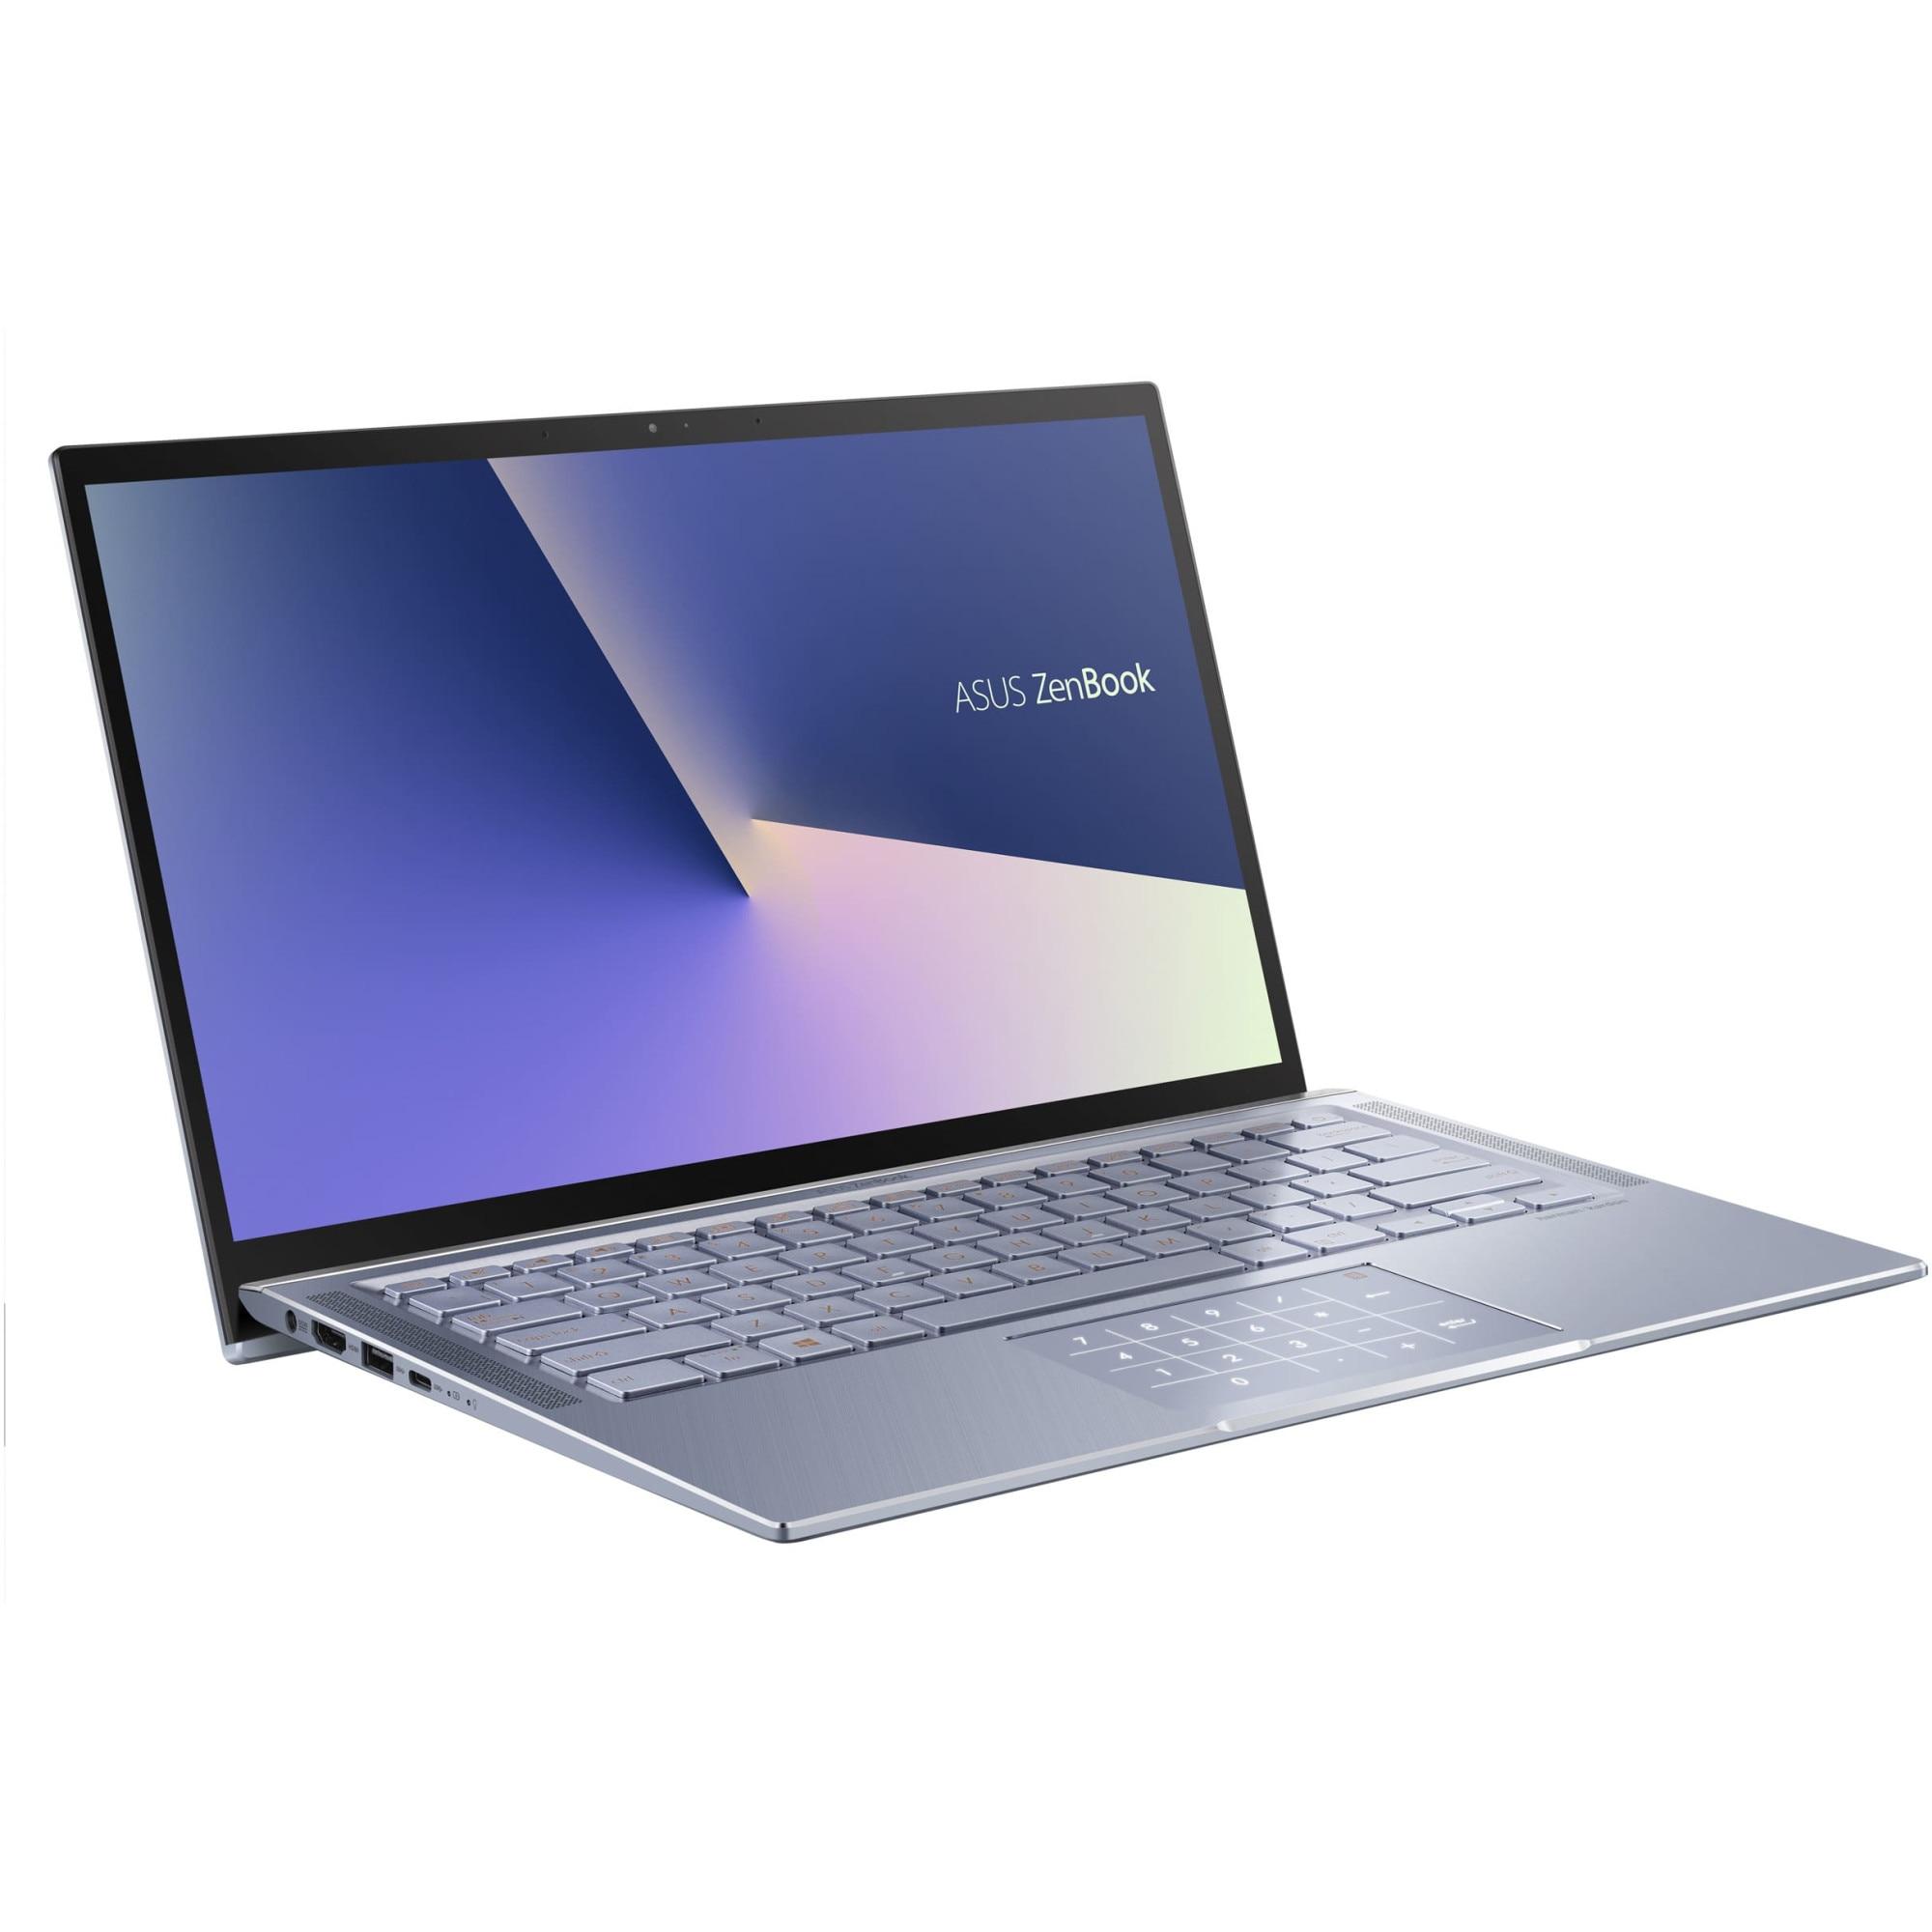 "Fotografie Laptop ultraportabil ASUS ZenBook 14 UM431DA cu procesor AMD Ryzen 5 3500U pana la 3.70 GHz, 14"", Full HD, 8GB, 512GB SSD, AMD Radeon™ Vega 8 Graphics, Endless OS, Utopia Blue Metal"